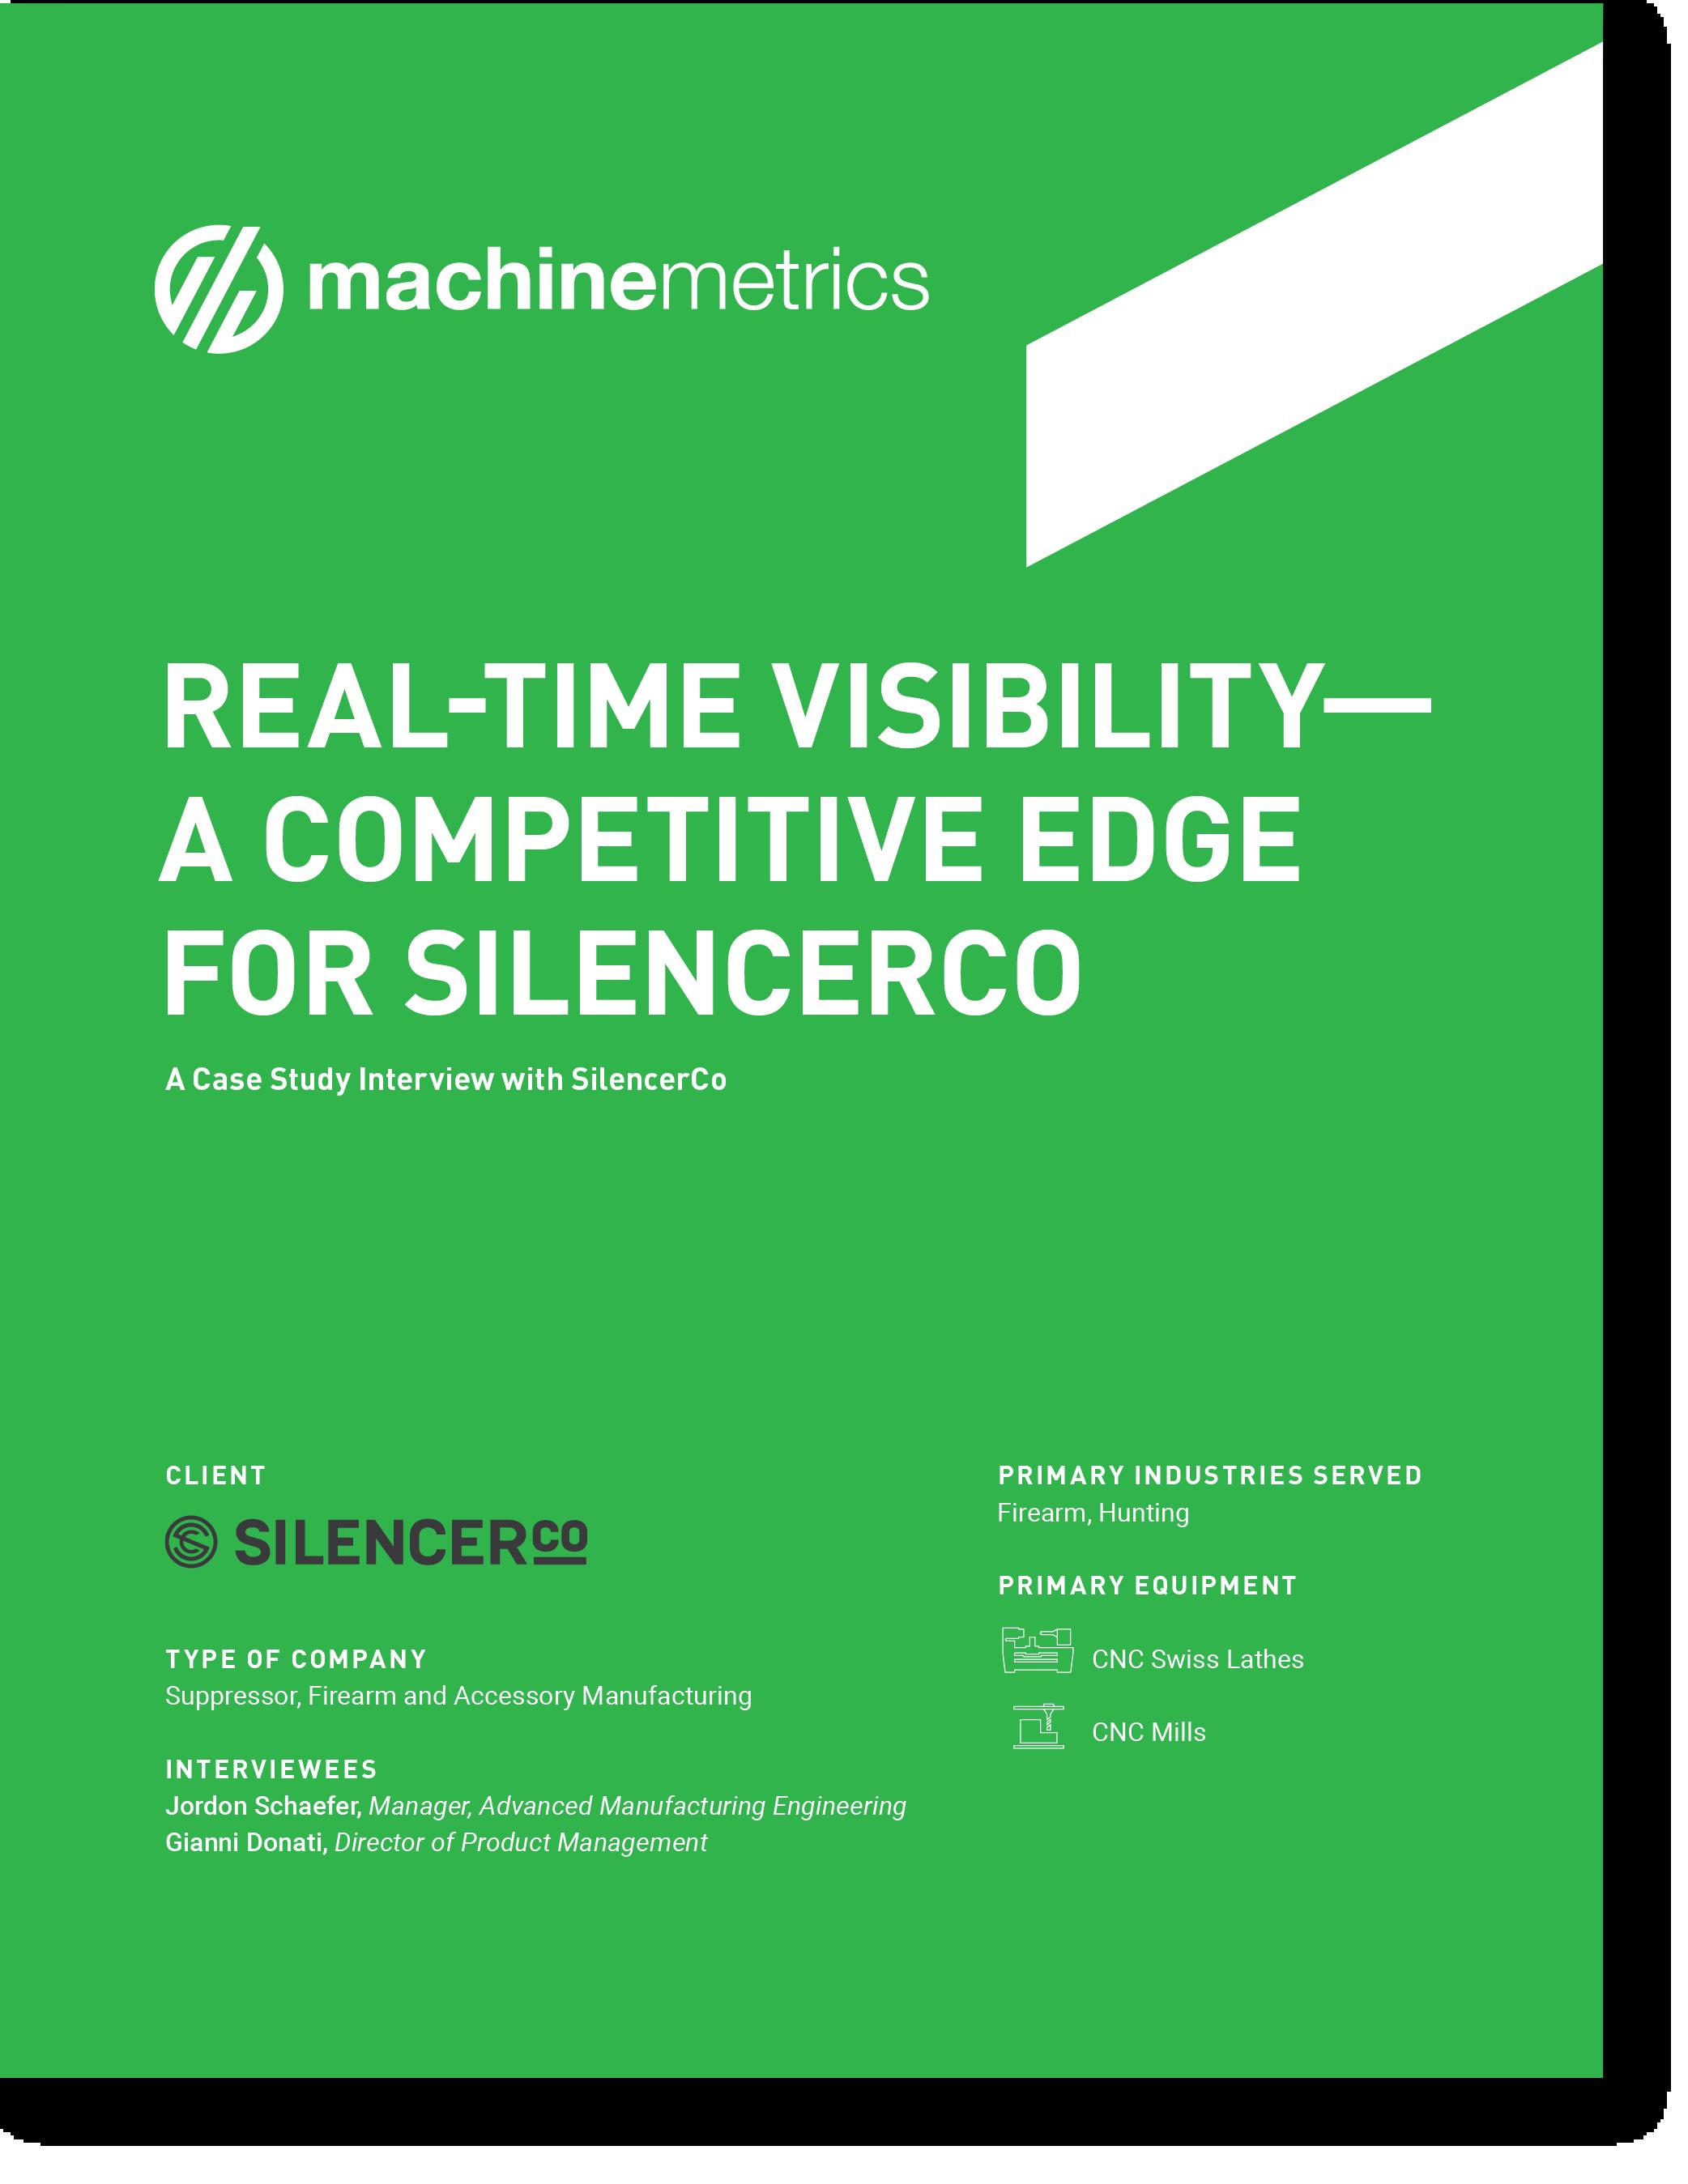 silencerco case study cover-13